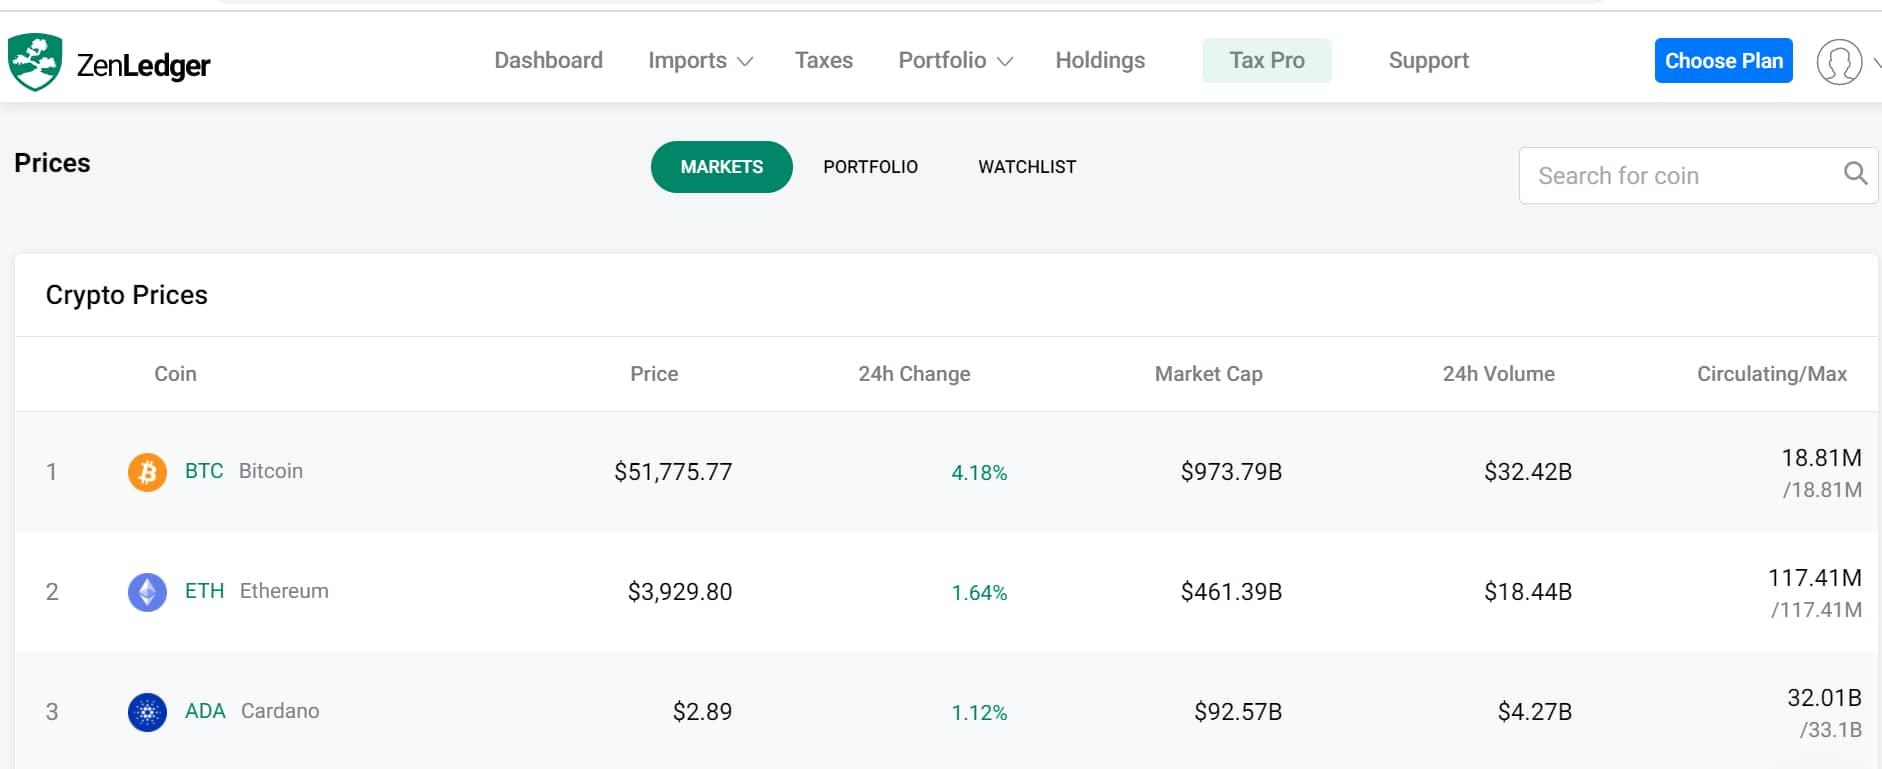 Zenledger crypto portfolio tracker